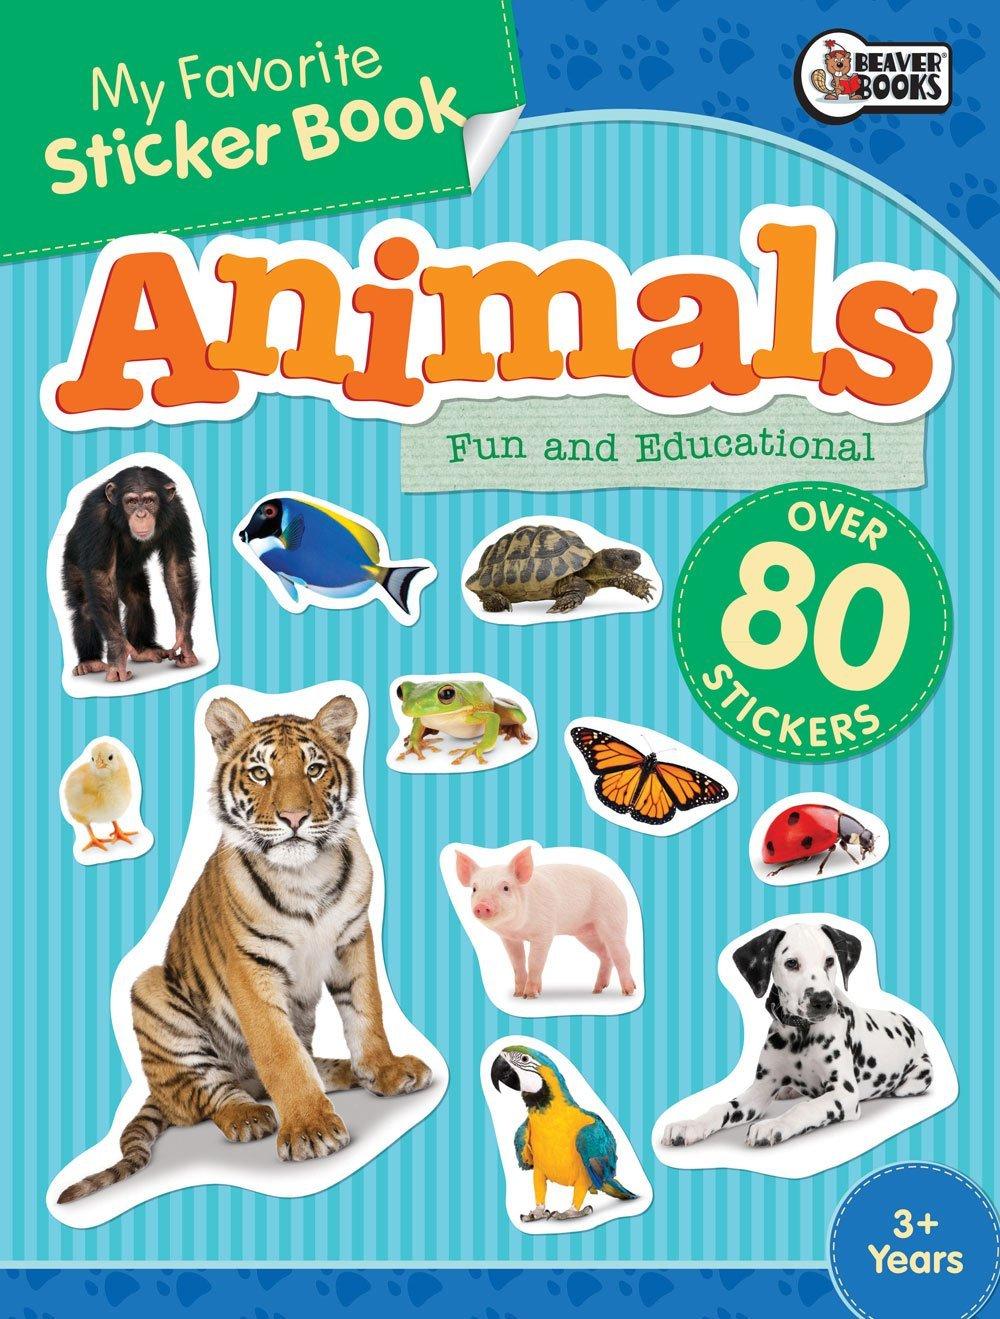 My Favorite Sticker Book: Animal